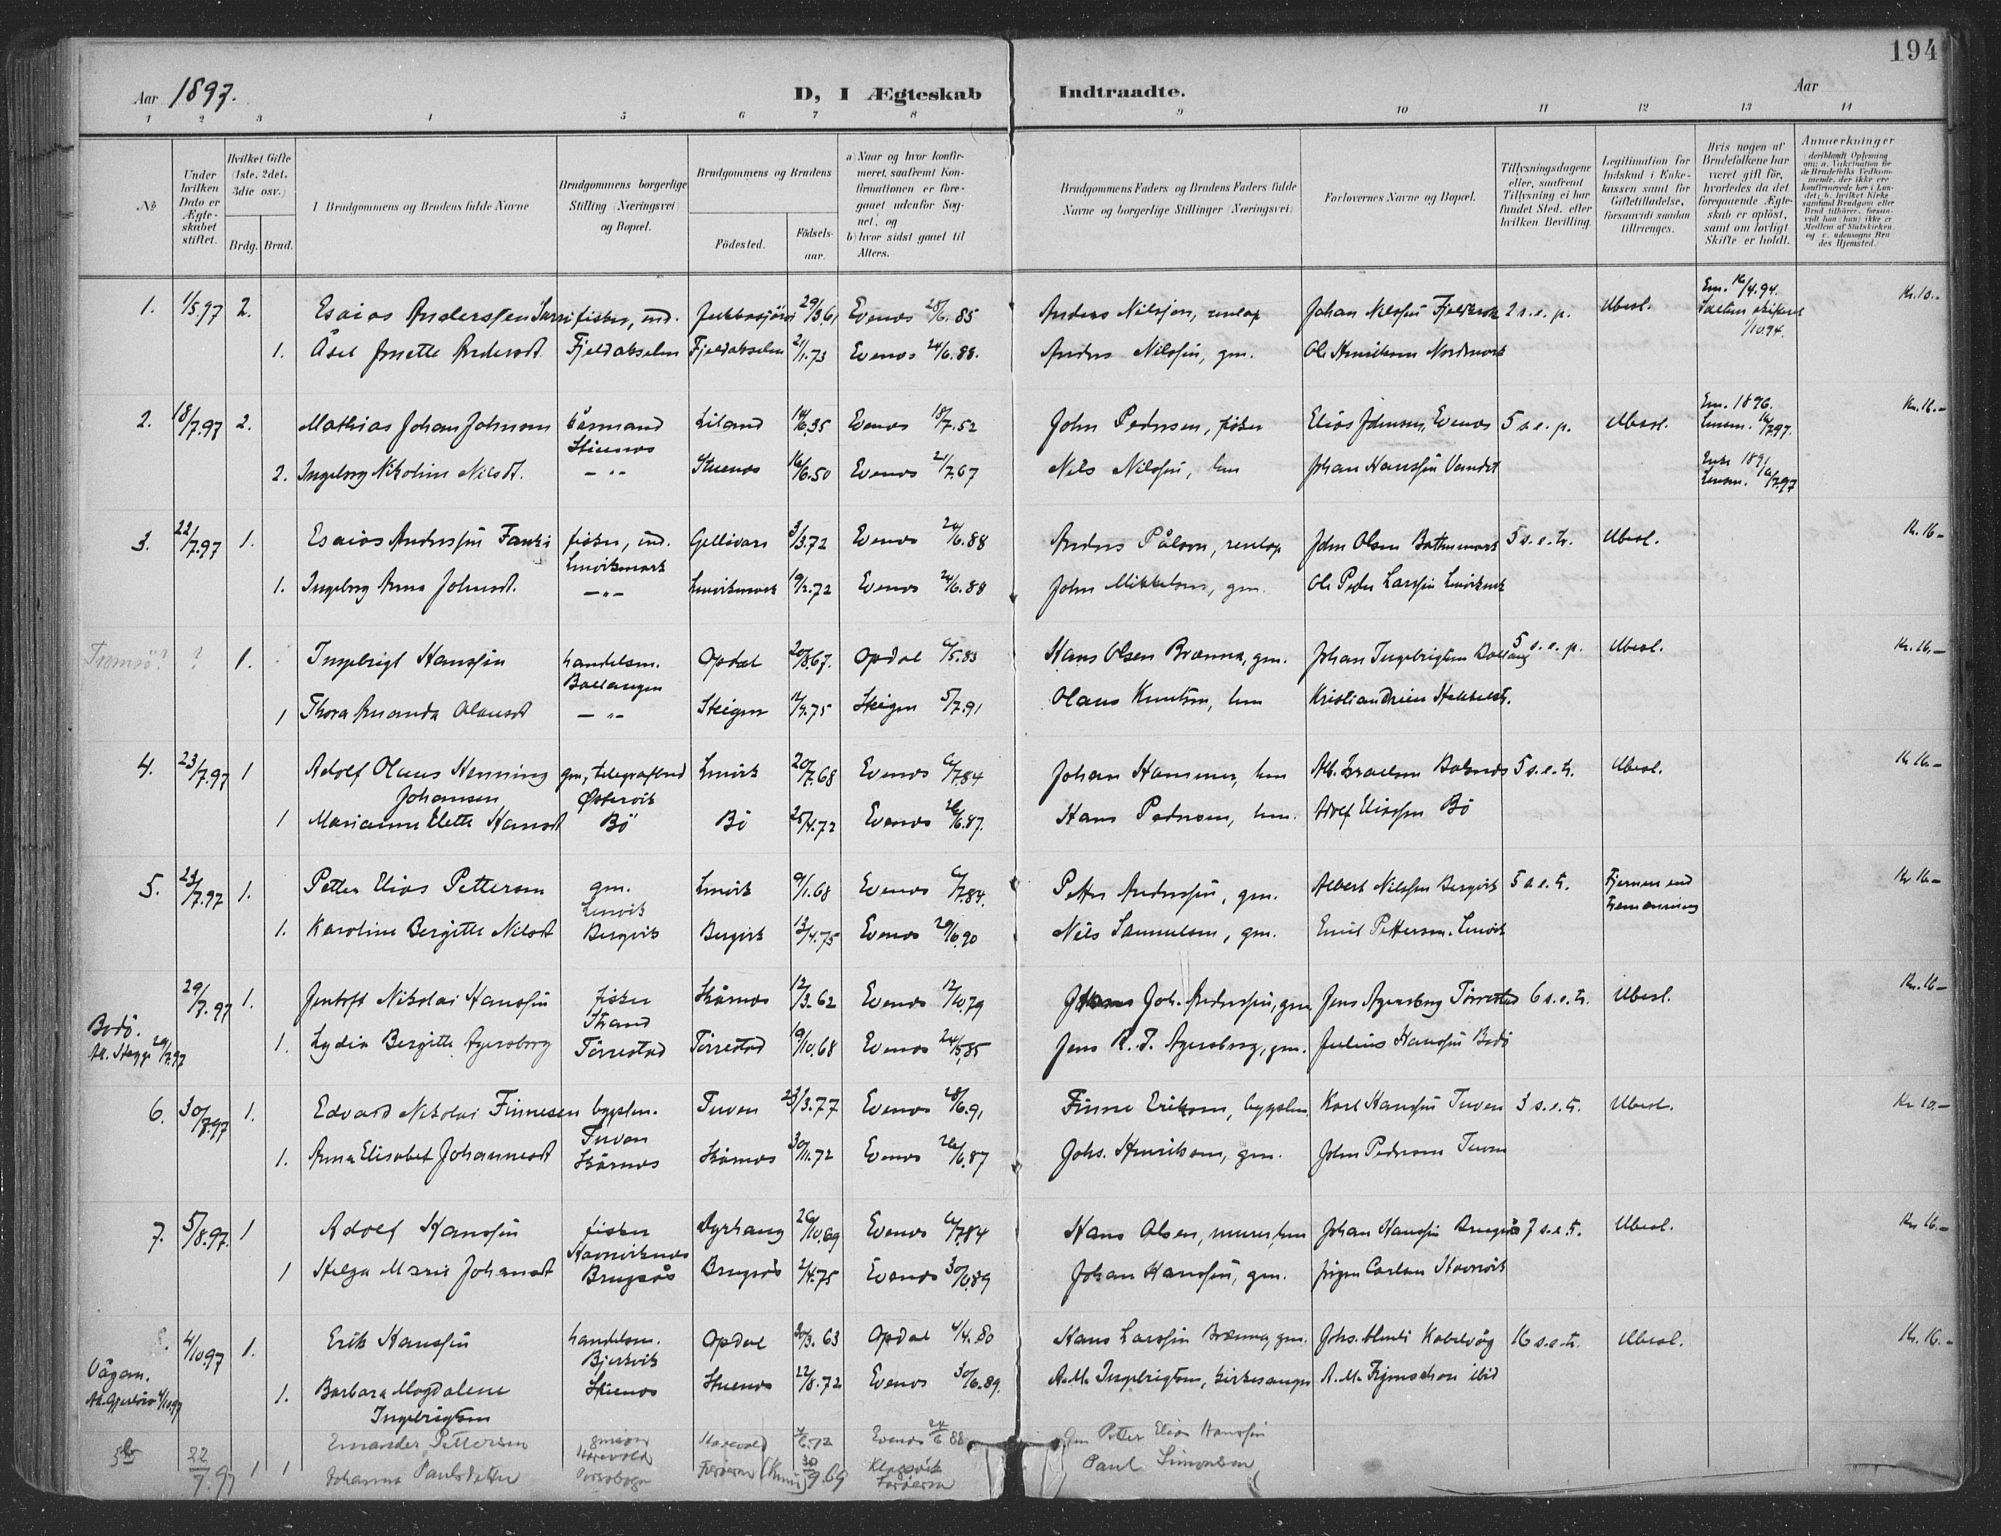 SAT, Ministerialprotokoller, klokkerbøker og fødselsregistre - Nordland, 863/L0899: Ministerialbok nr. 863A11, 1897-1906, s. 194